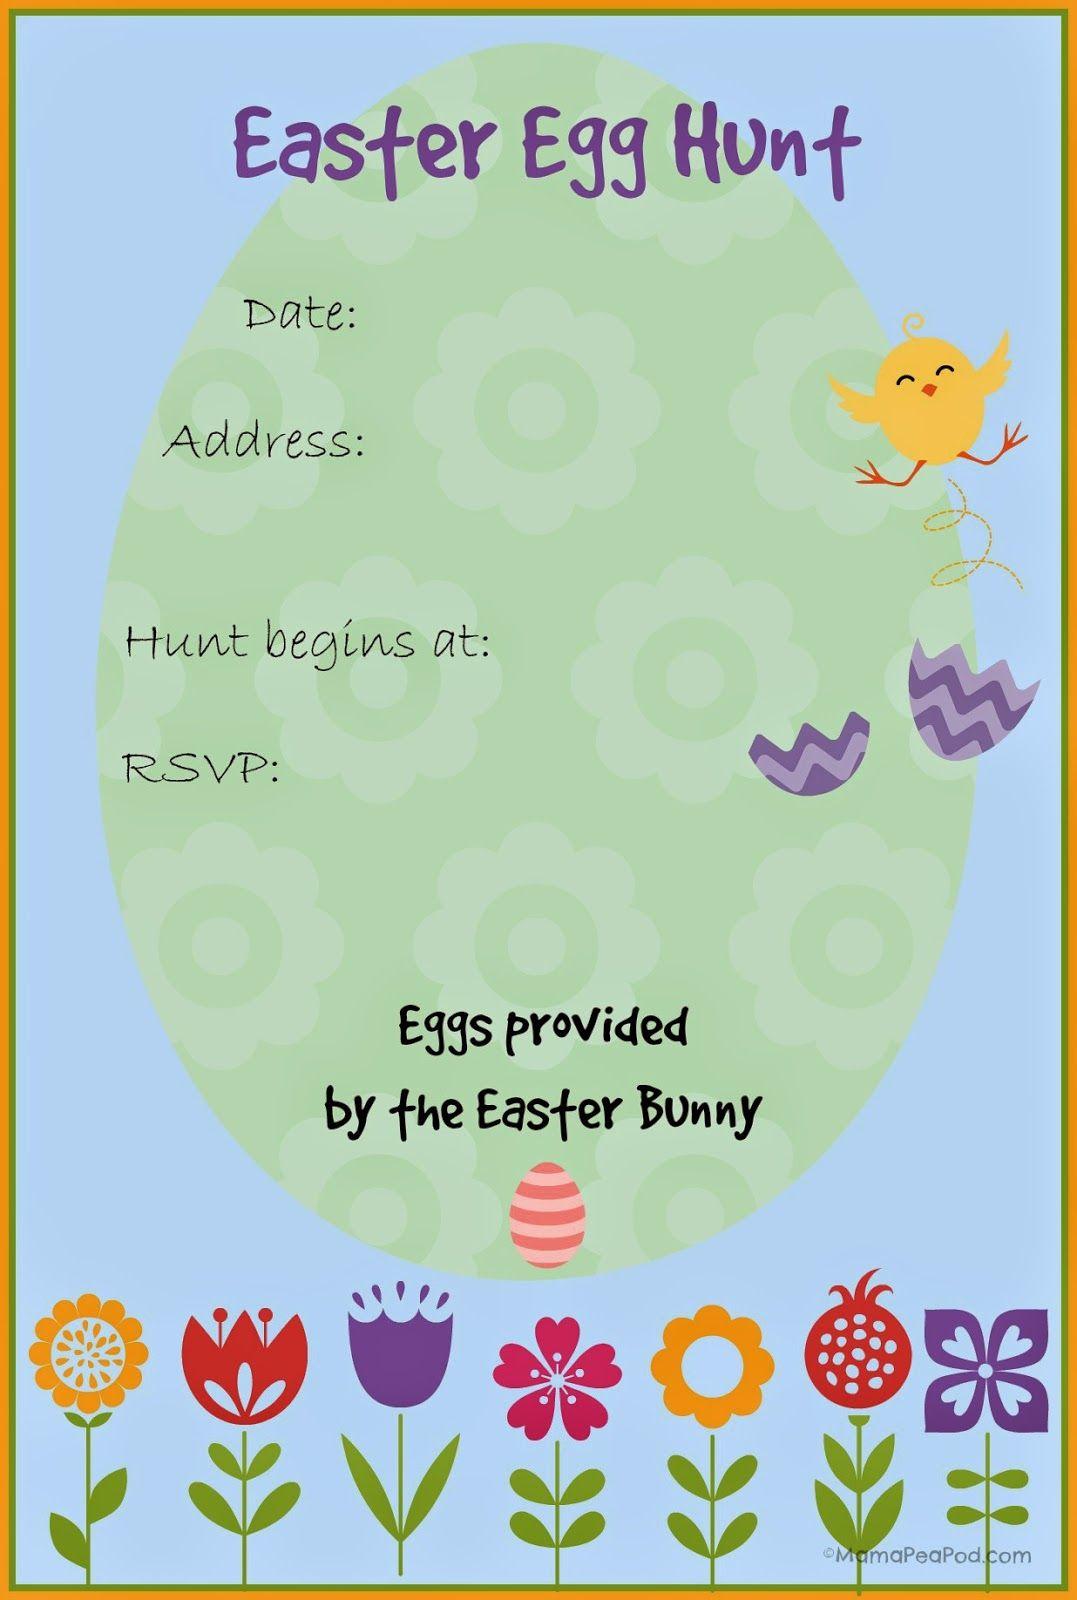 Free Printable Easter Egg Hunt Invitation